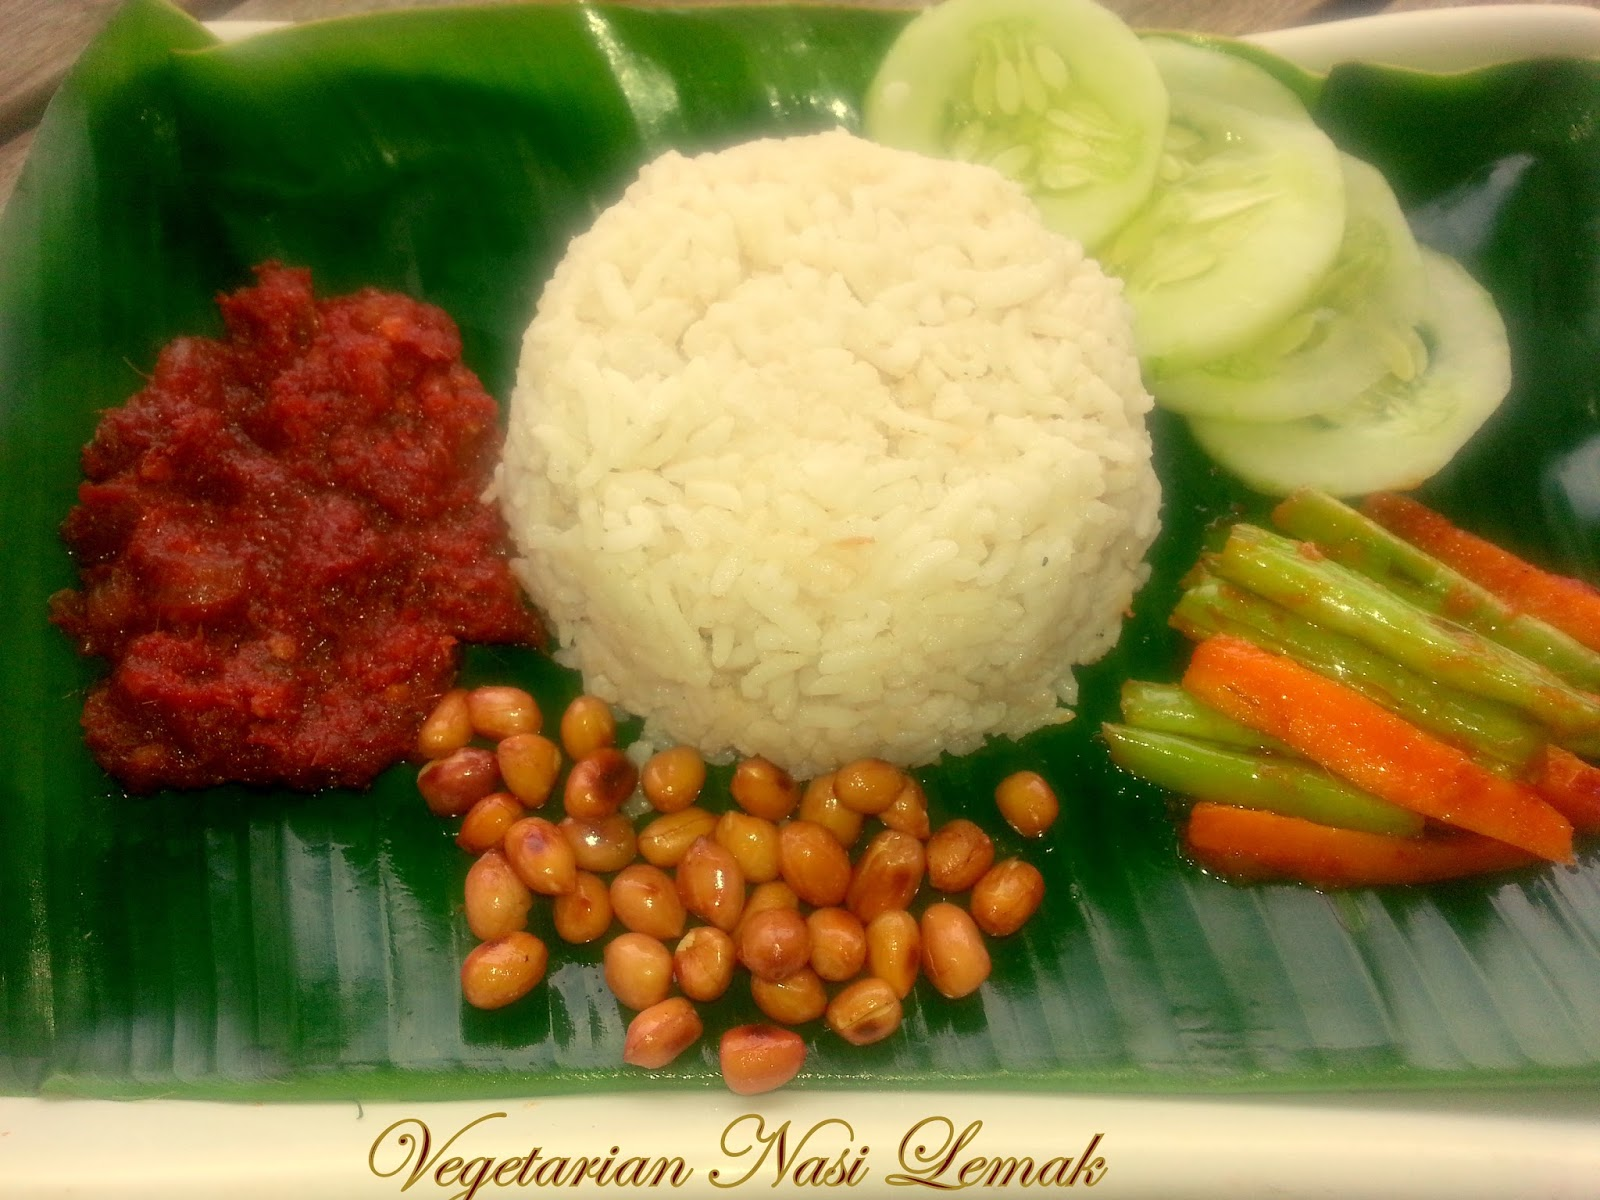 Annapurna vegetarian nasi lemak recipe malaysian cuisine for Annapurna cuisine